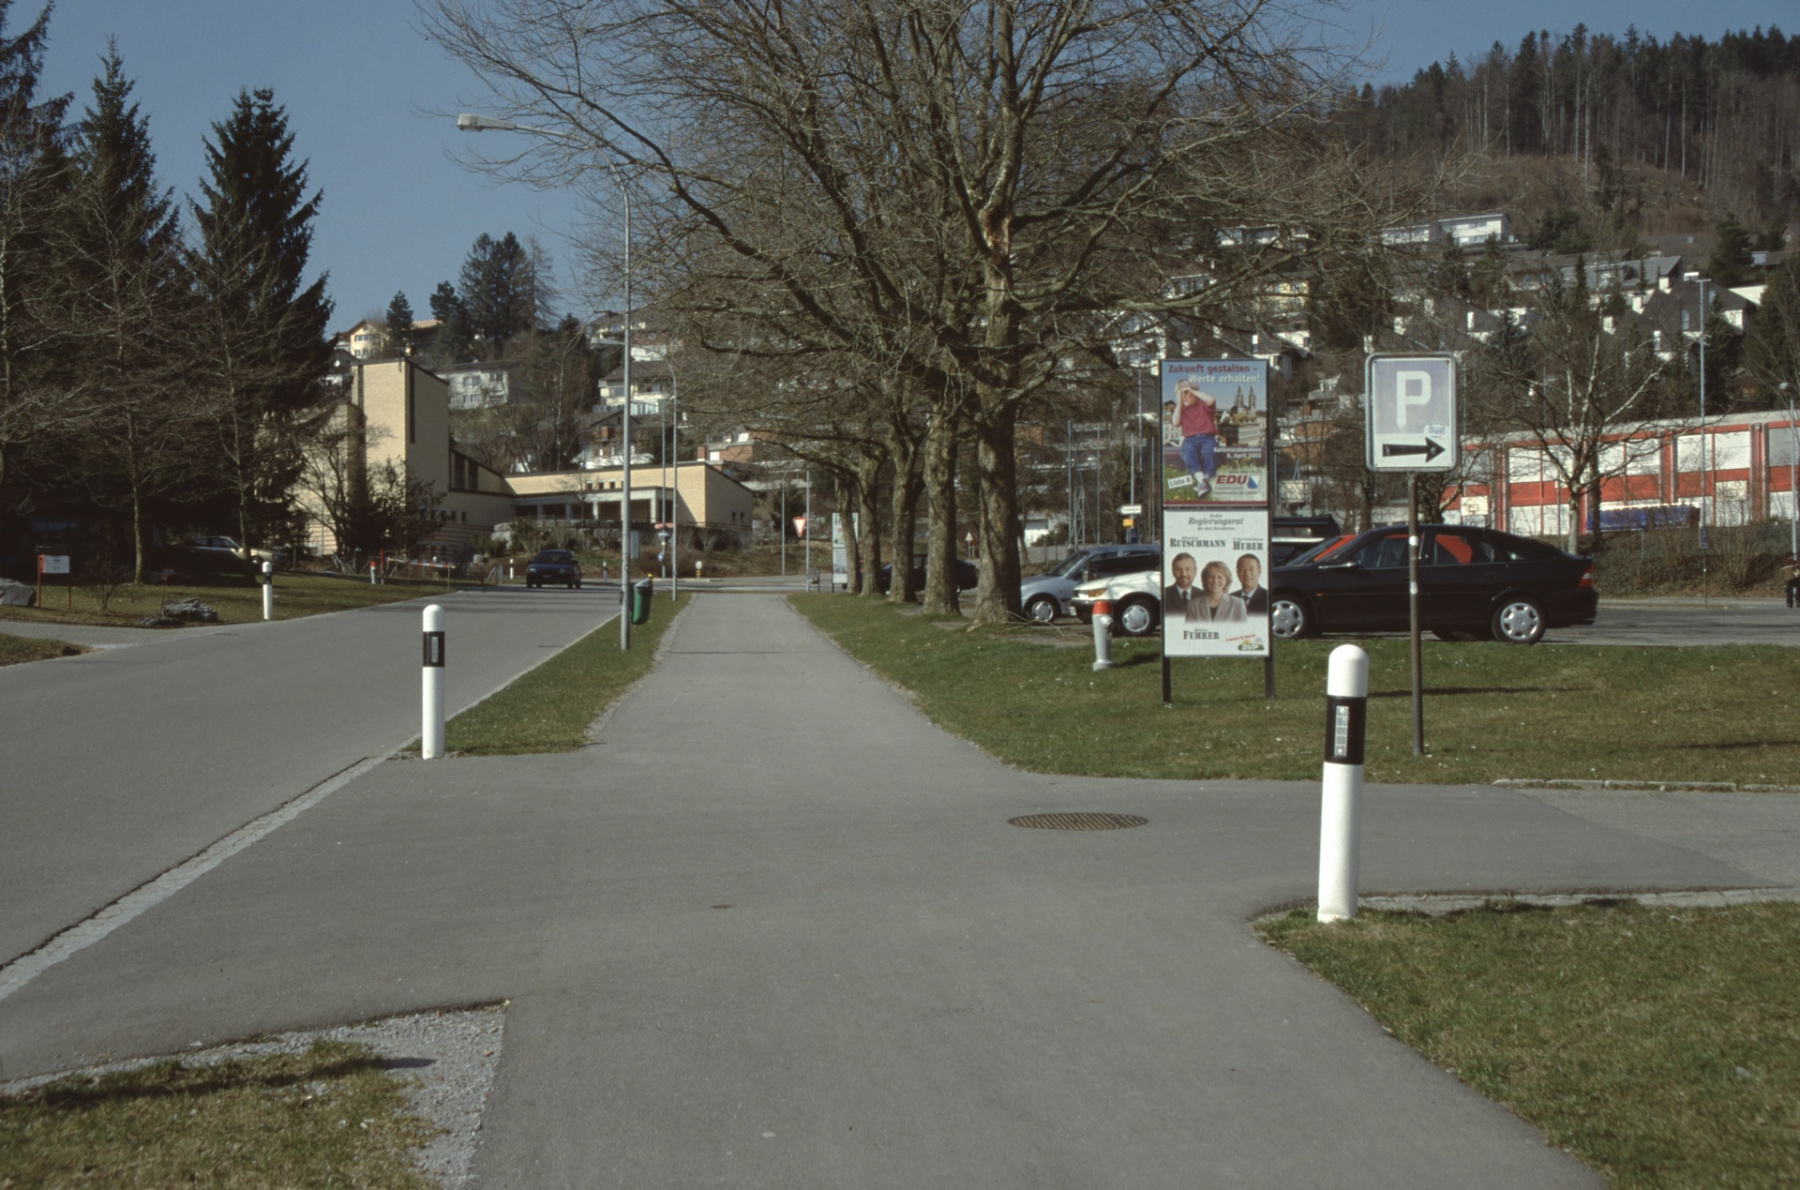 Ende Bahnhofstr., Blick Rtg. Lettenkreuzung mit kath. Kirche, Sek.Schulhaus